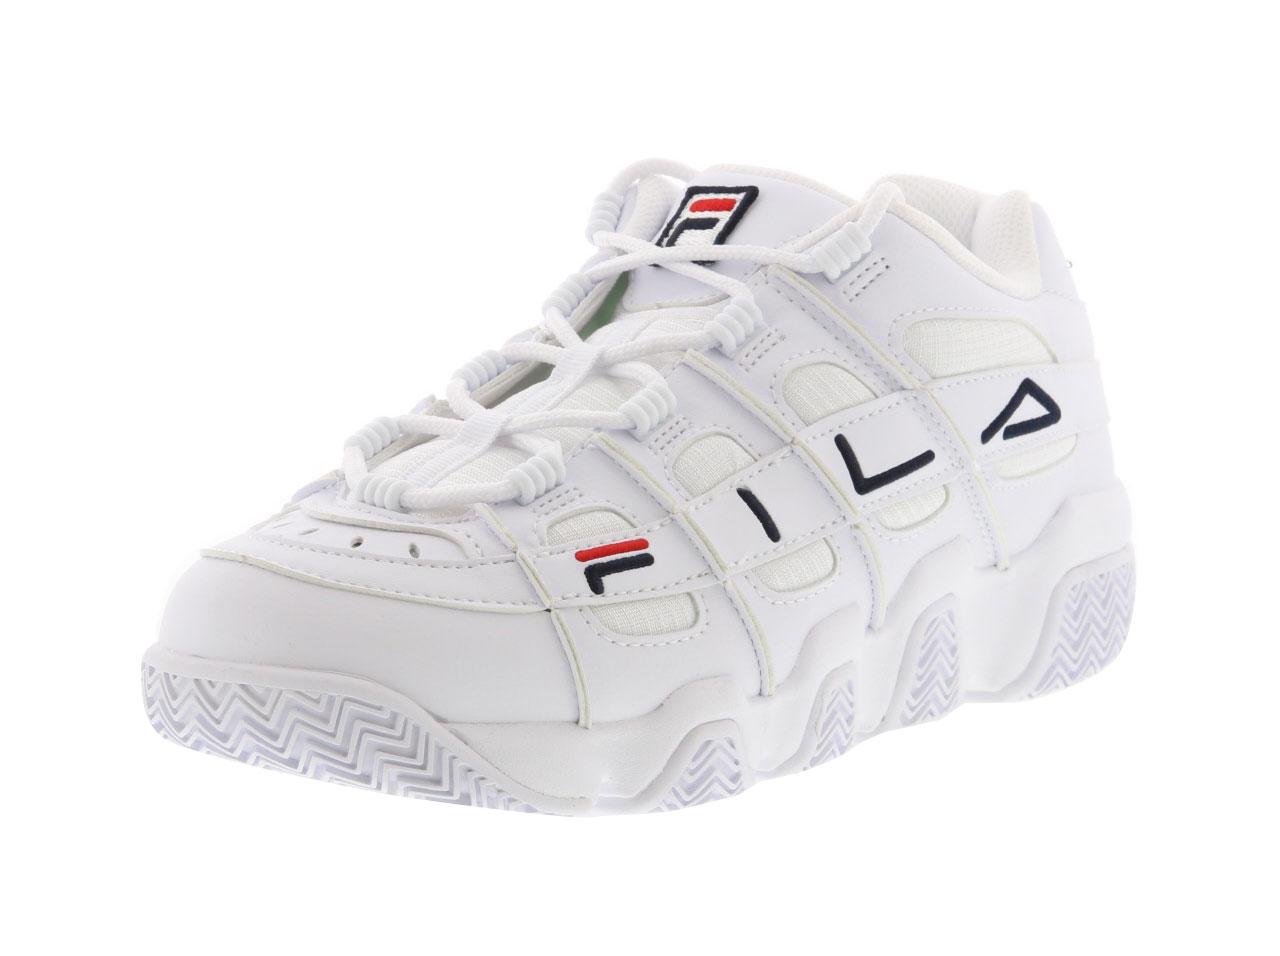 【SALE】FILA BARRICADE XT 97 - WHITE